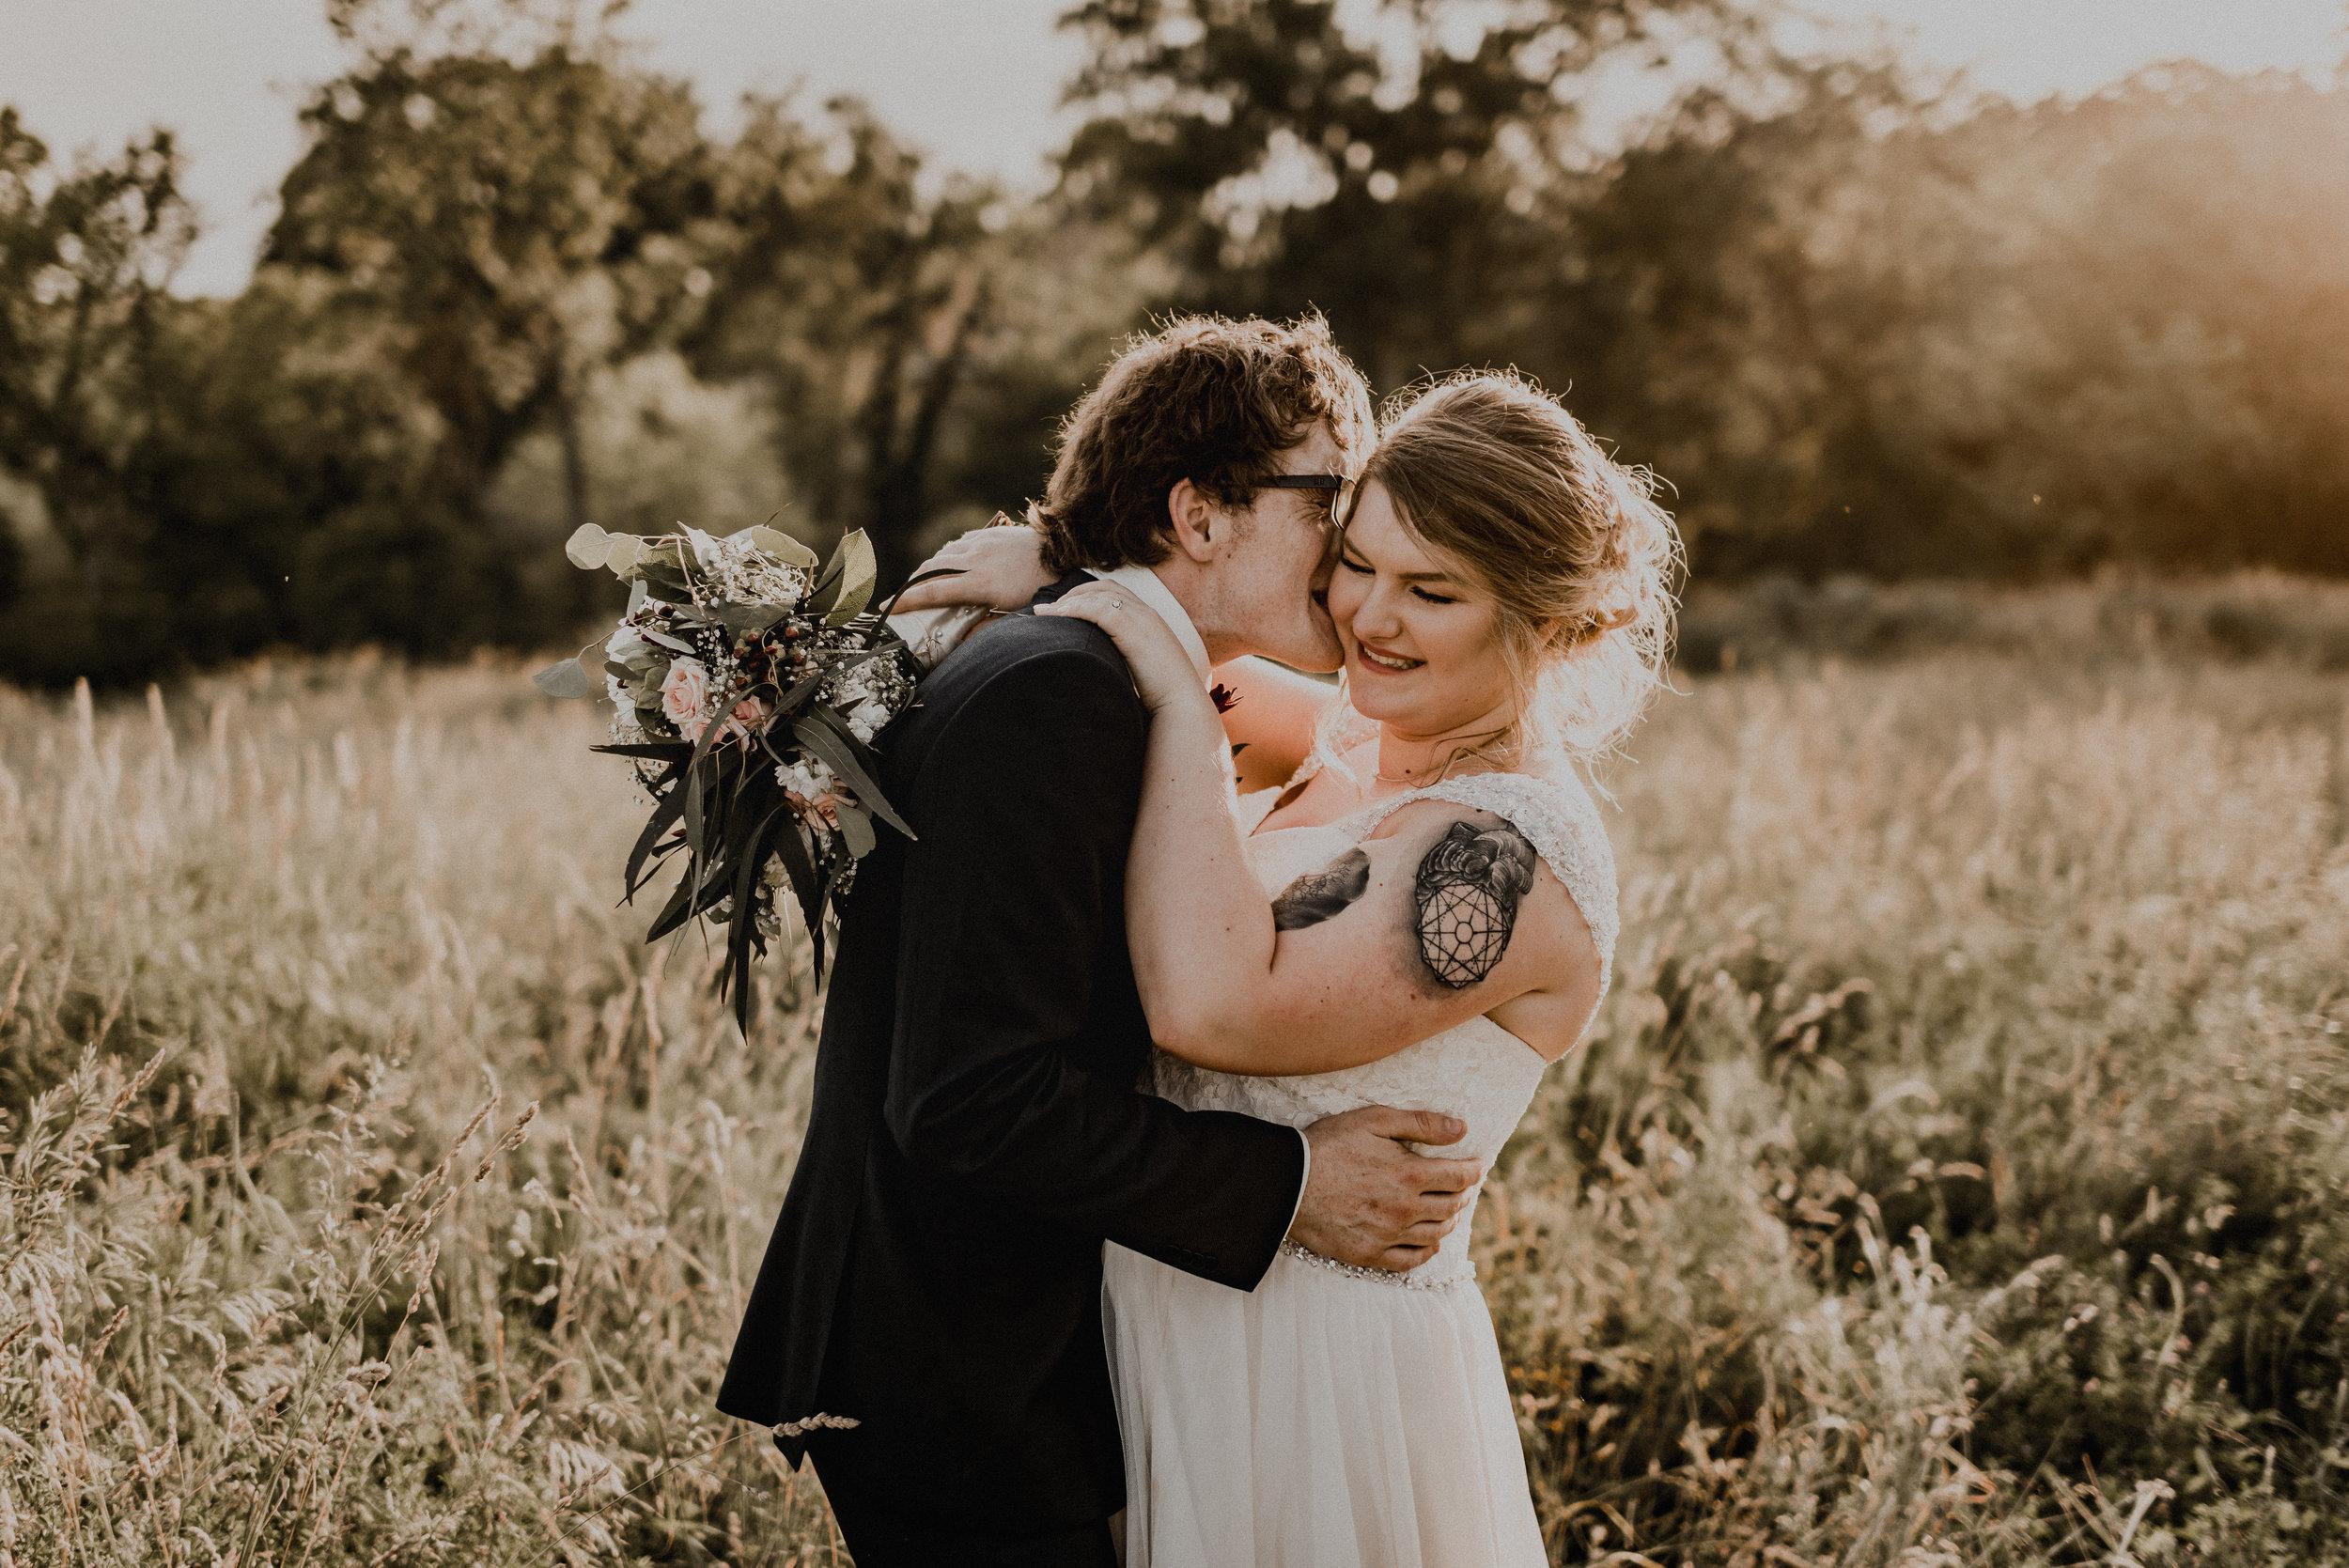 Melissa Cervantes Photography Iowa + Midwest Destination Wedding Photography - Ian + Amy-463.jpg